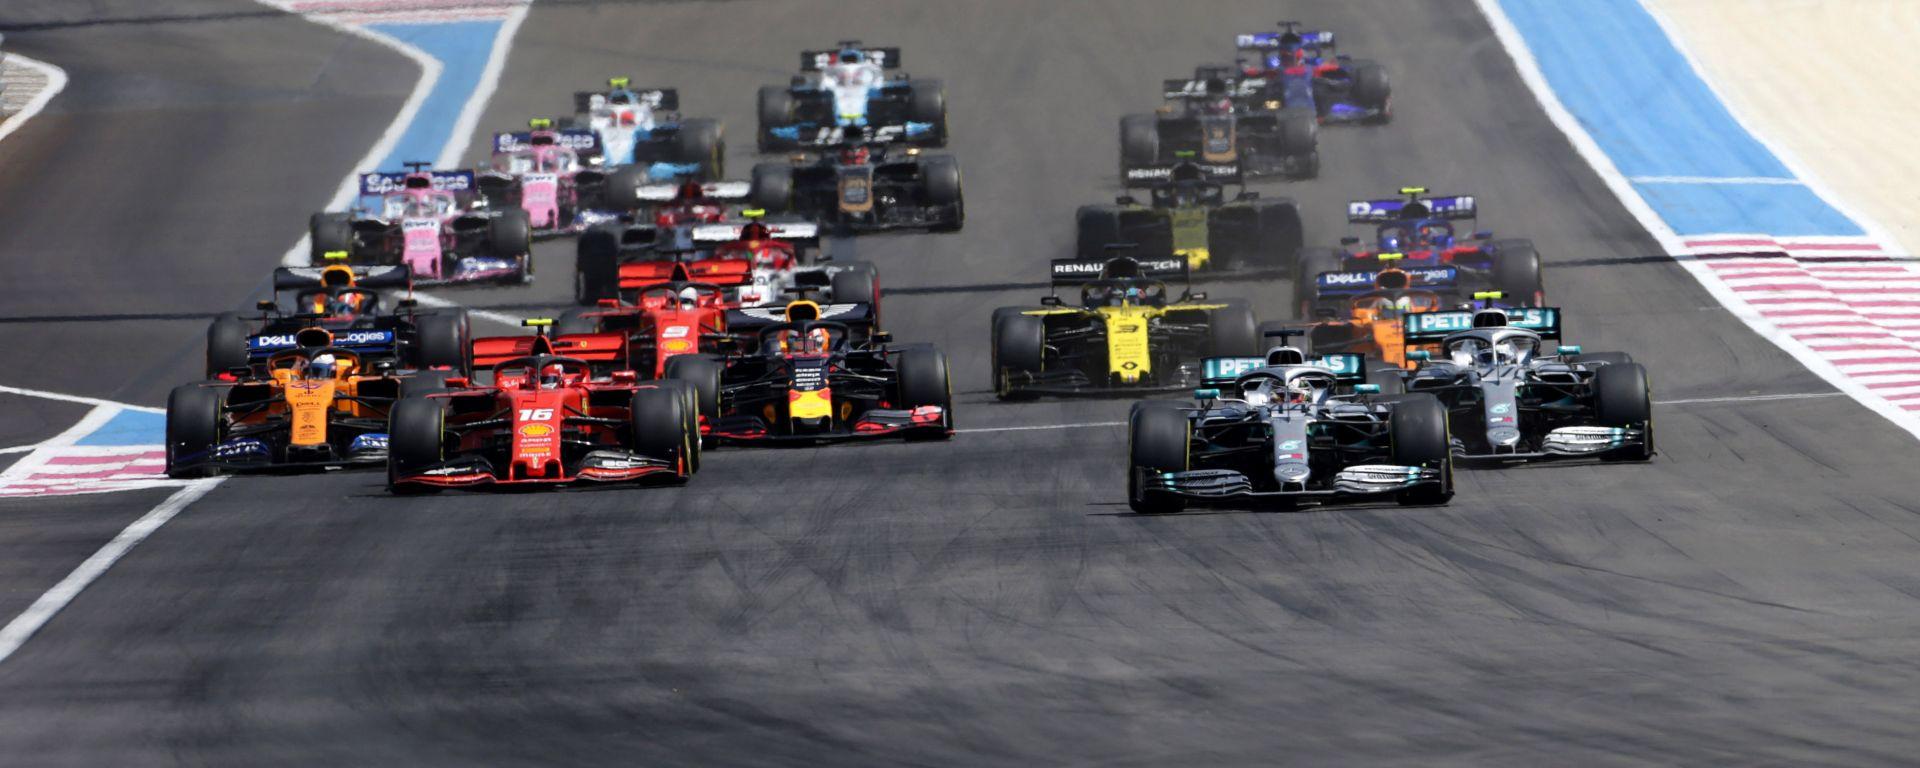 F1 GP Francia 2019, Le Castellet: la partenza